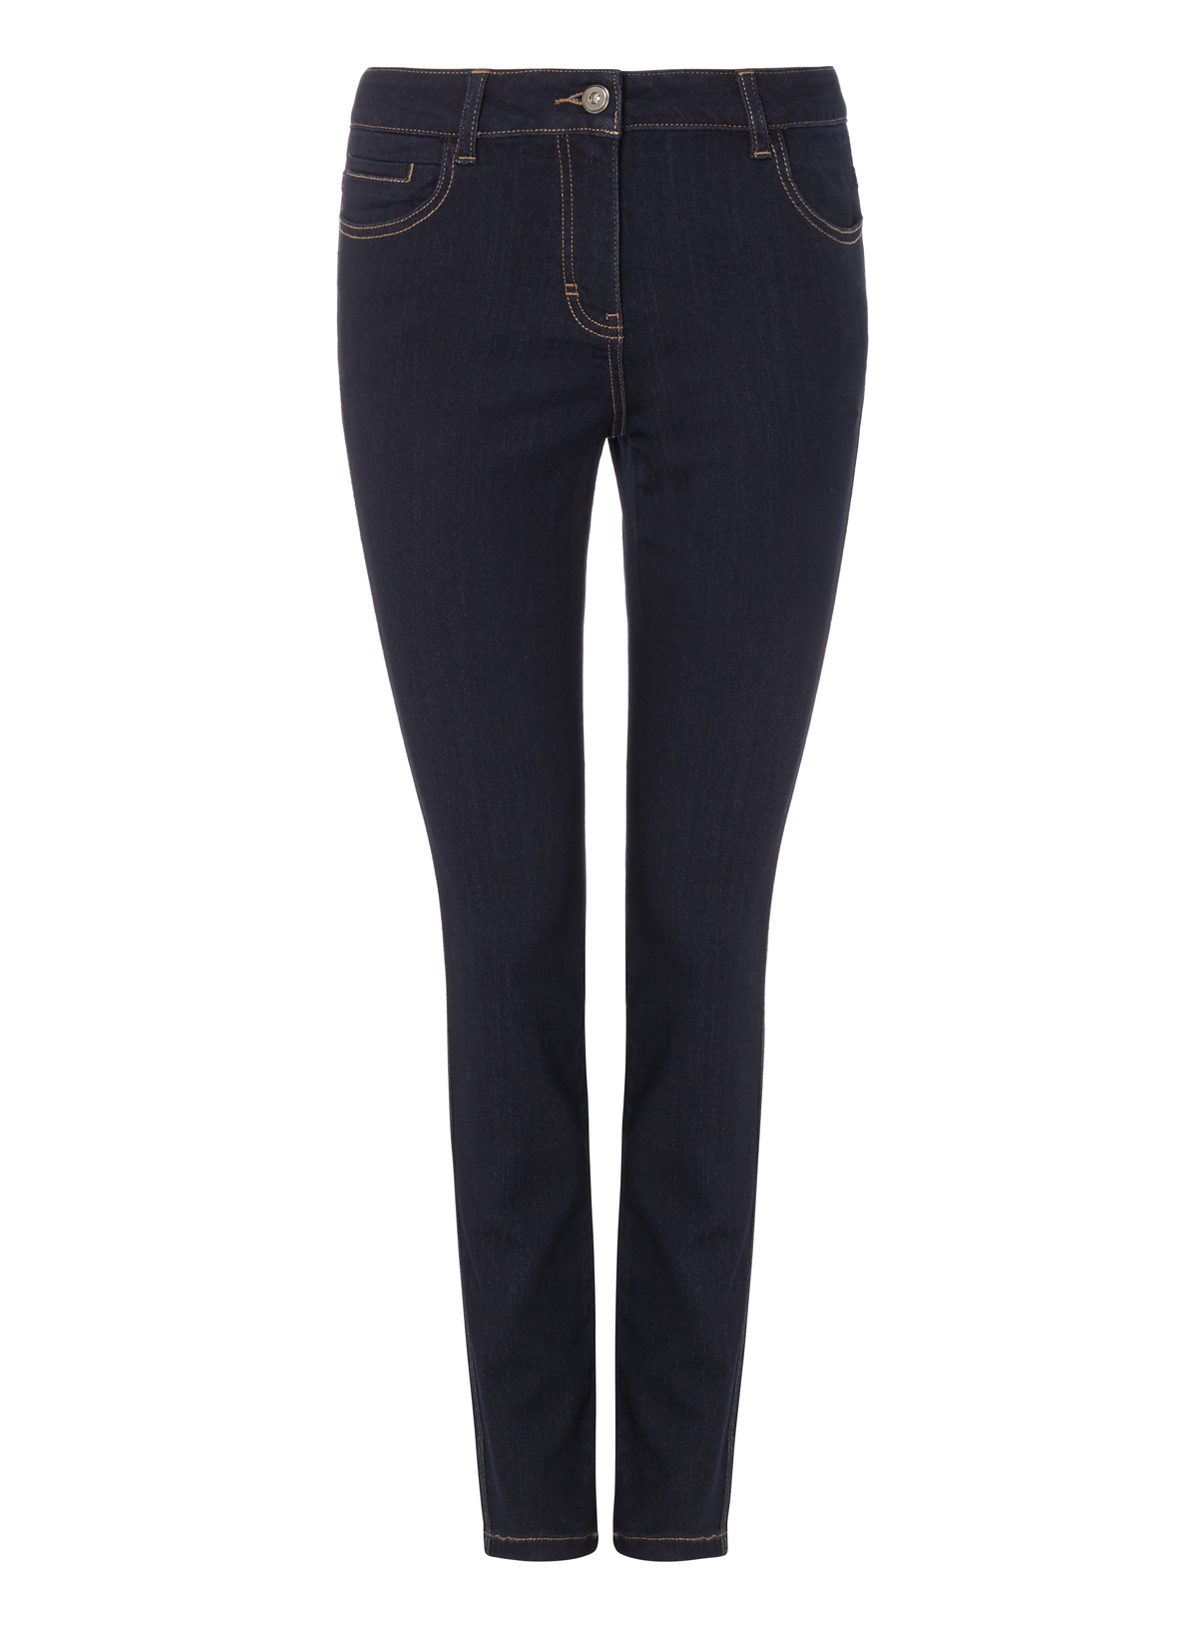 Womens Navy Dark Wash Skinny Jeans | Tu clothing